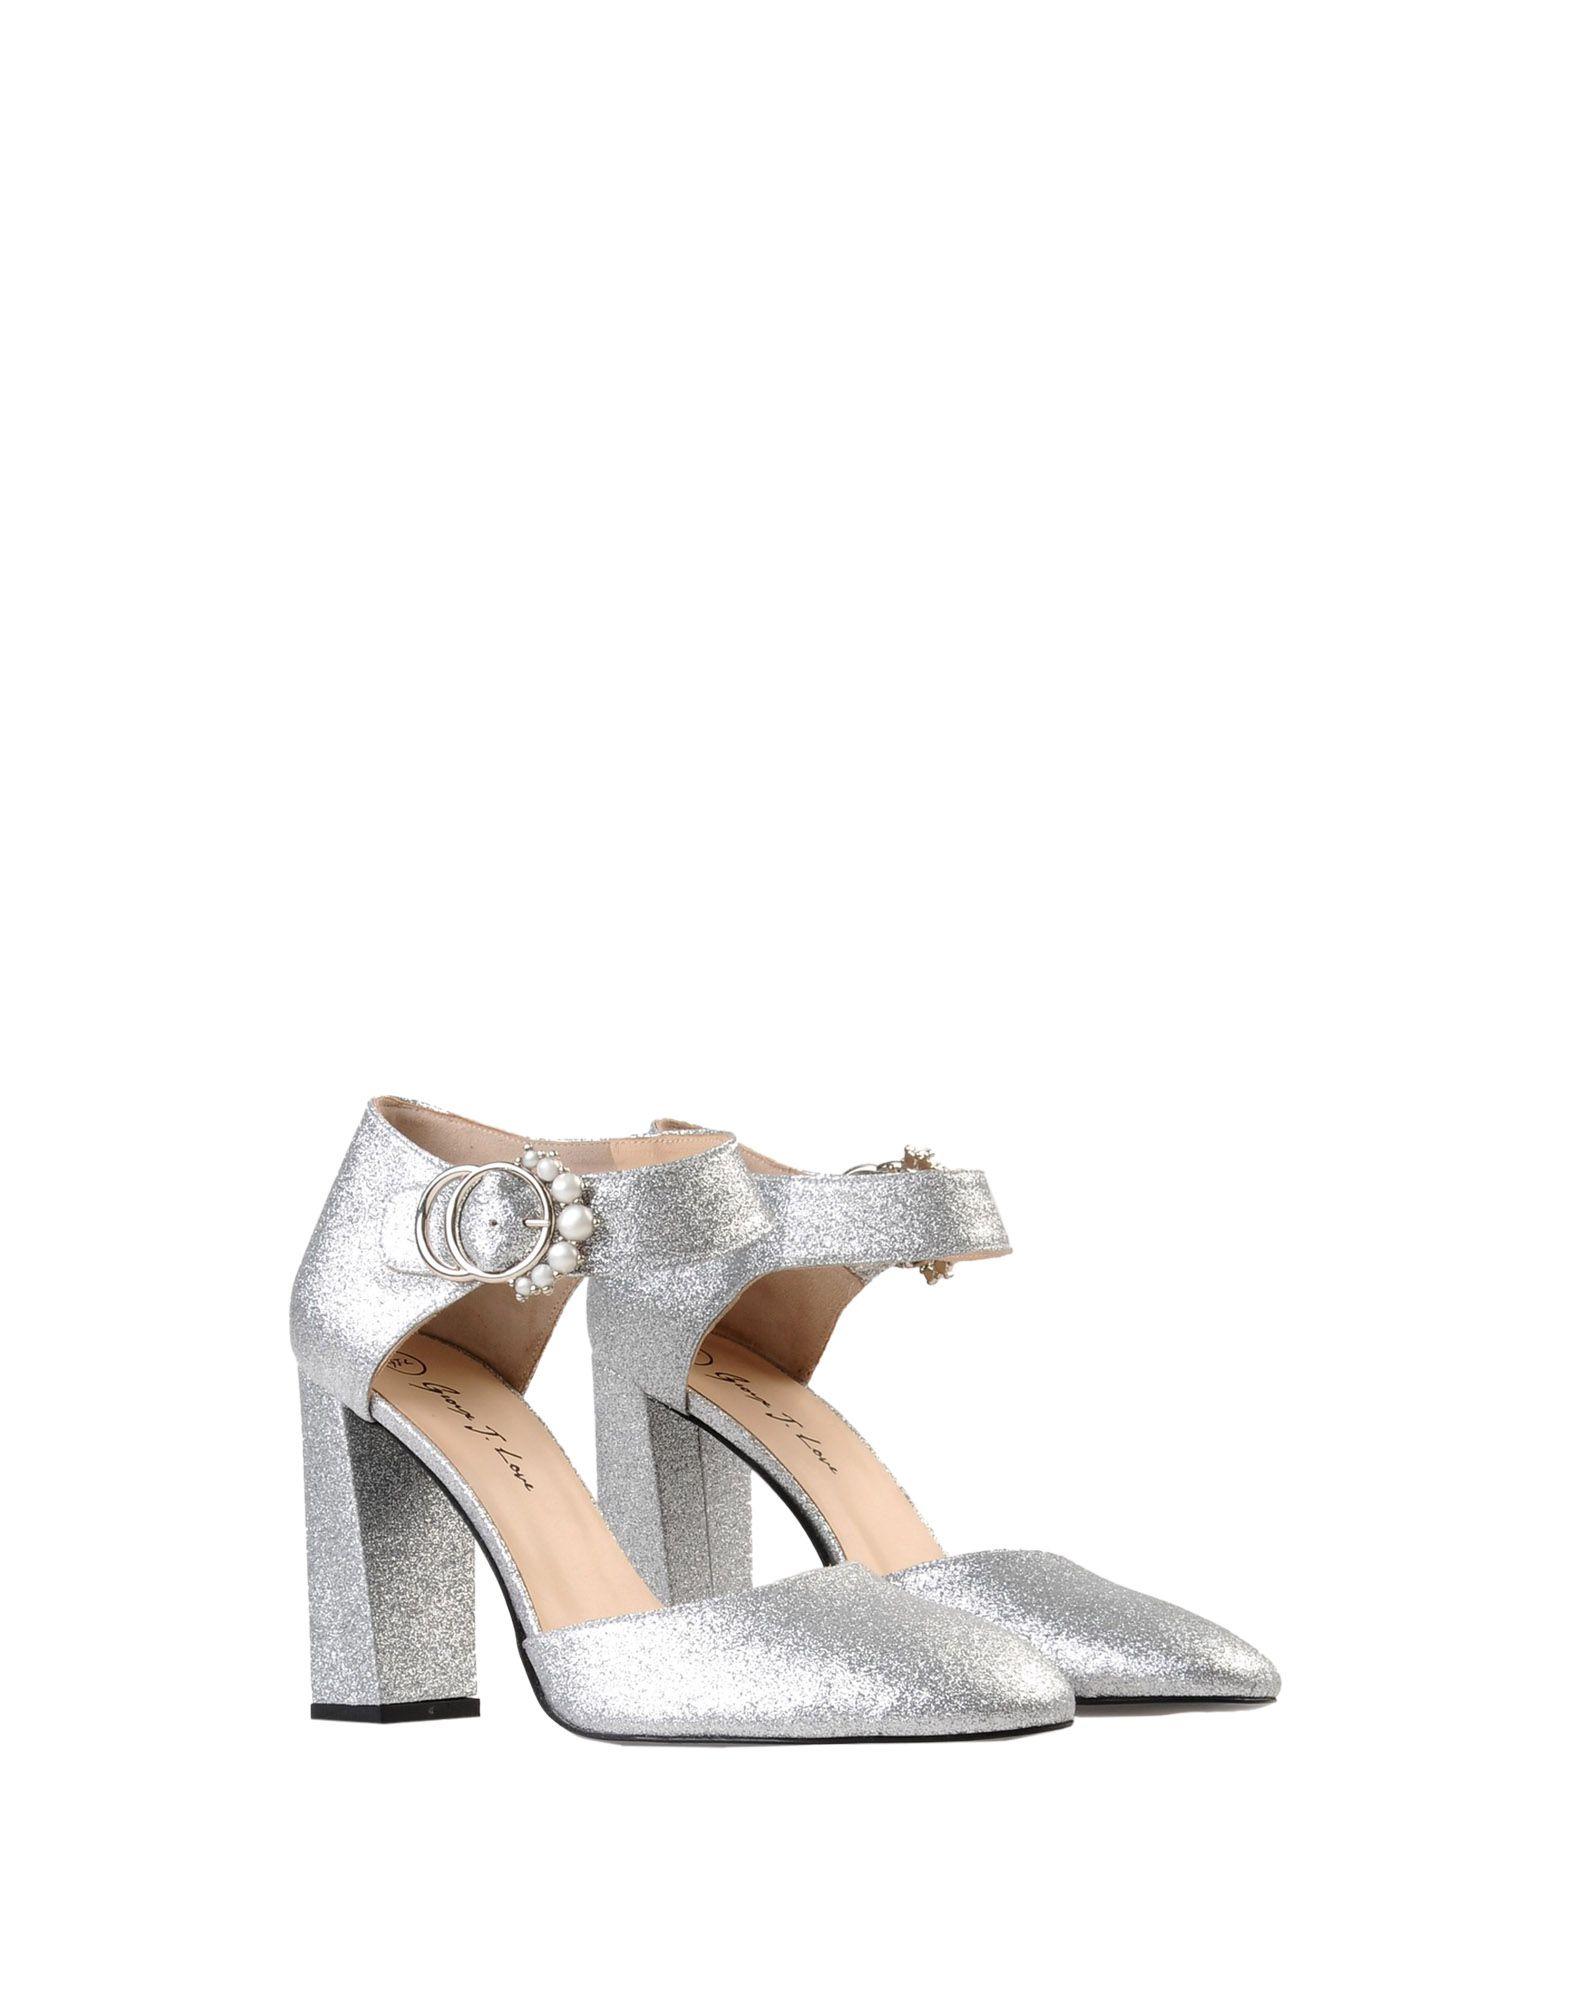 Gut um billige Love Schuhe zu tragenGeorge J. Love billige Pumps Damen  11538435DR 3d91a1